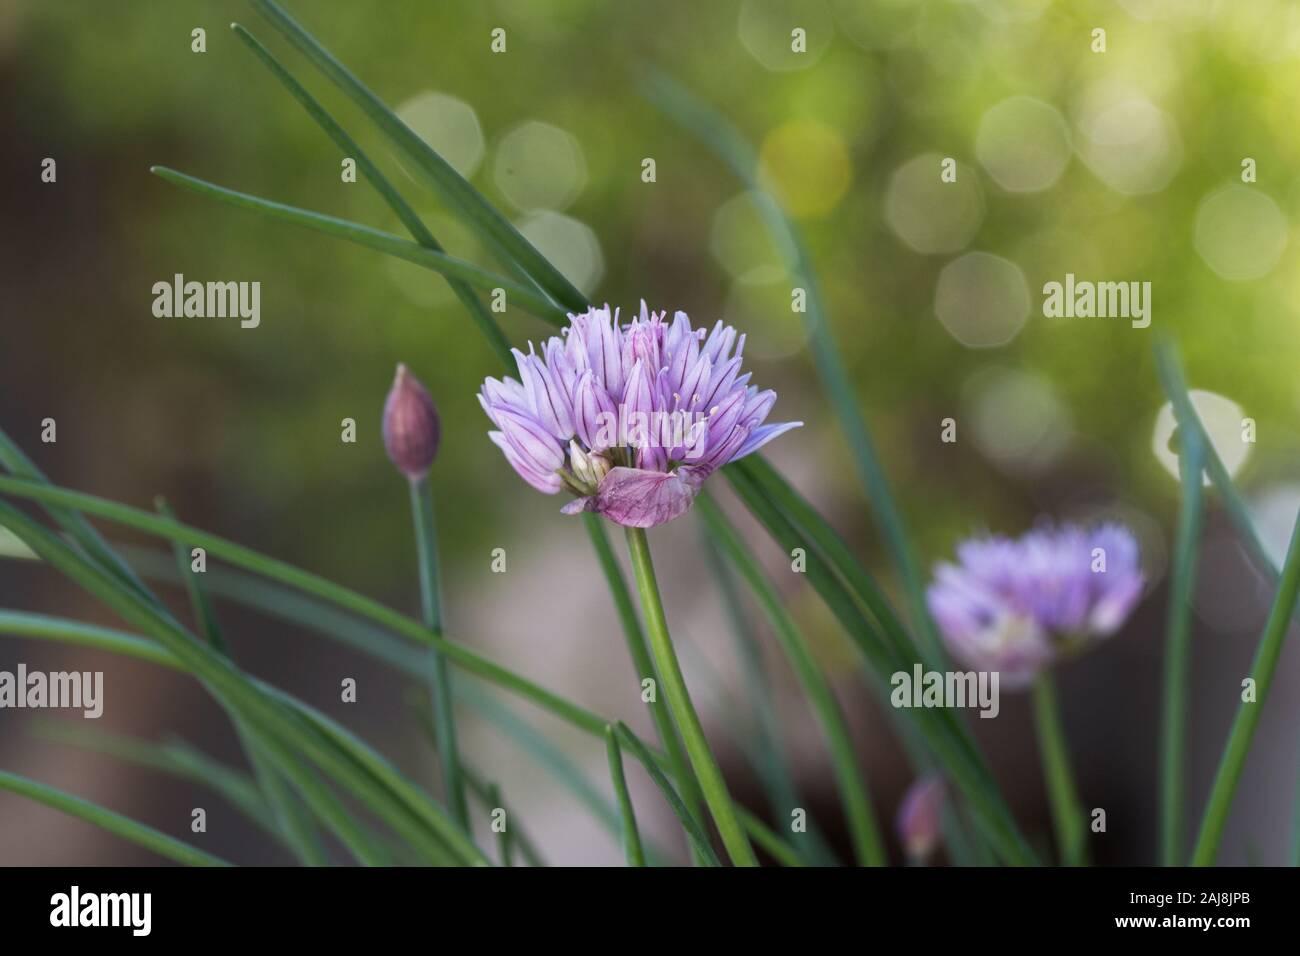 Chives (Allium schoenoprasum) plant in bloom close up. Stock Photo